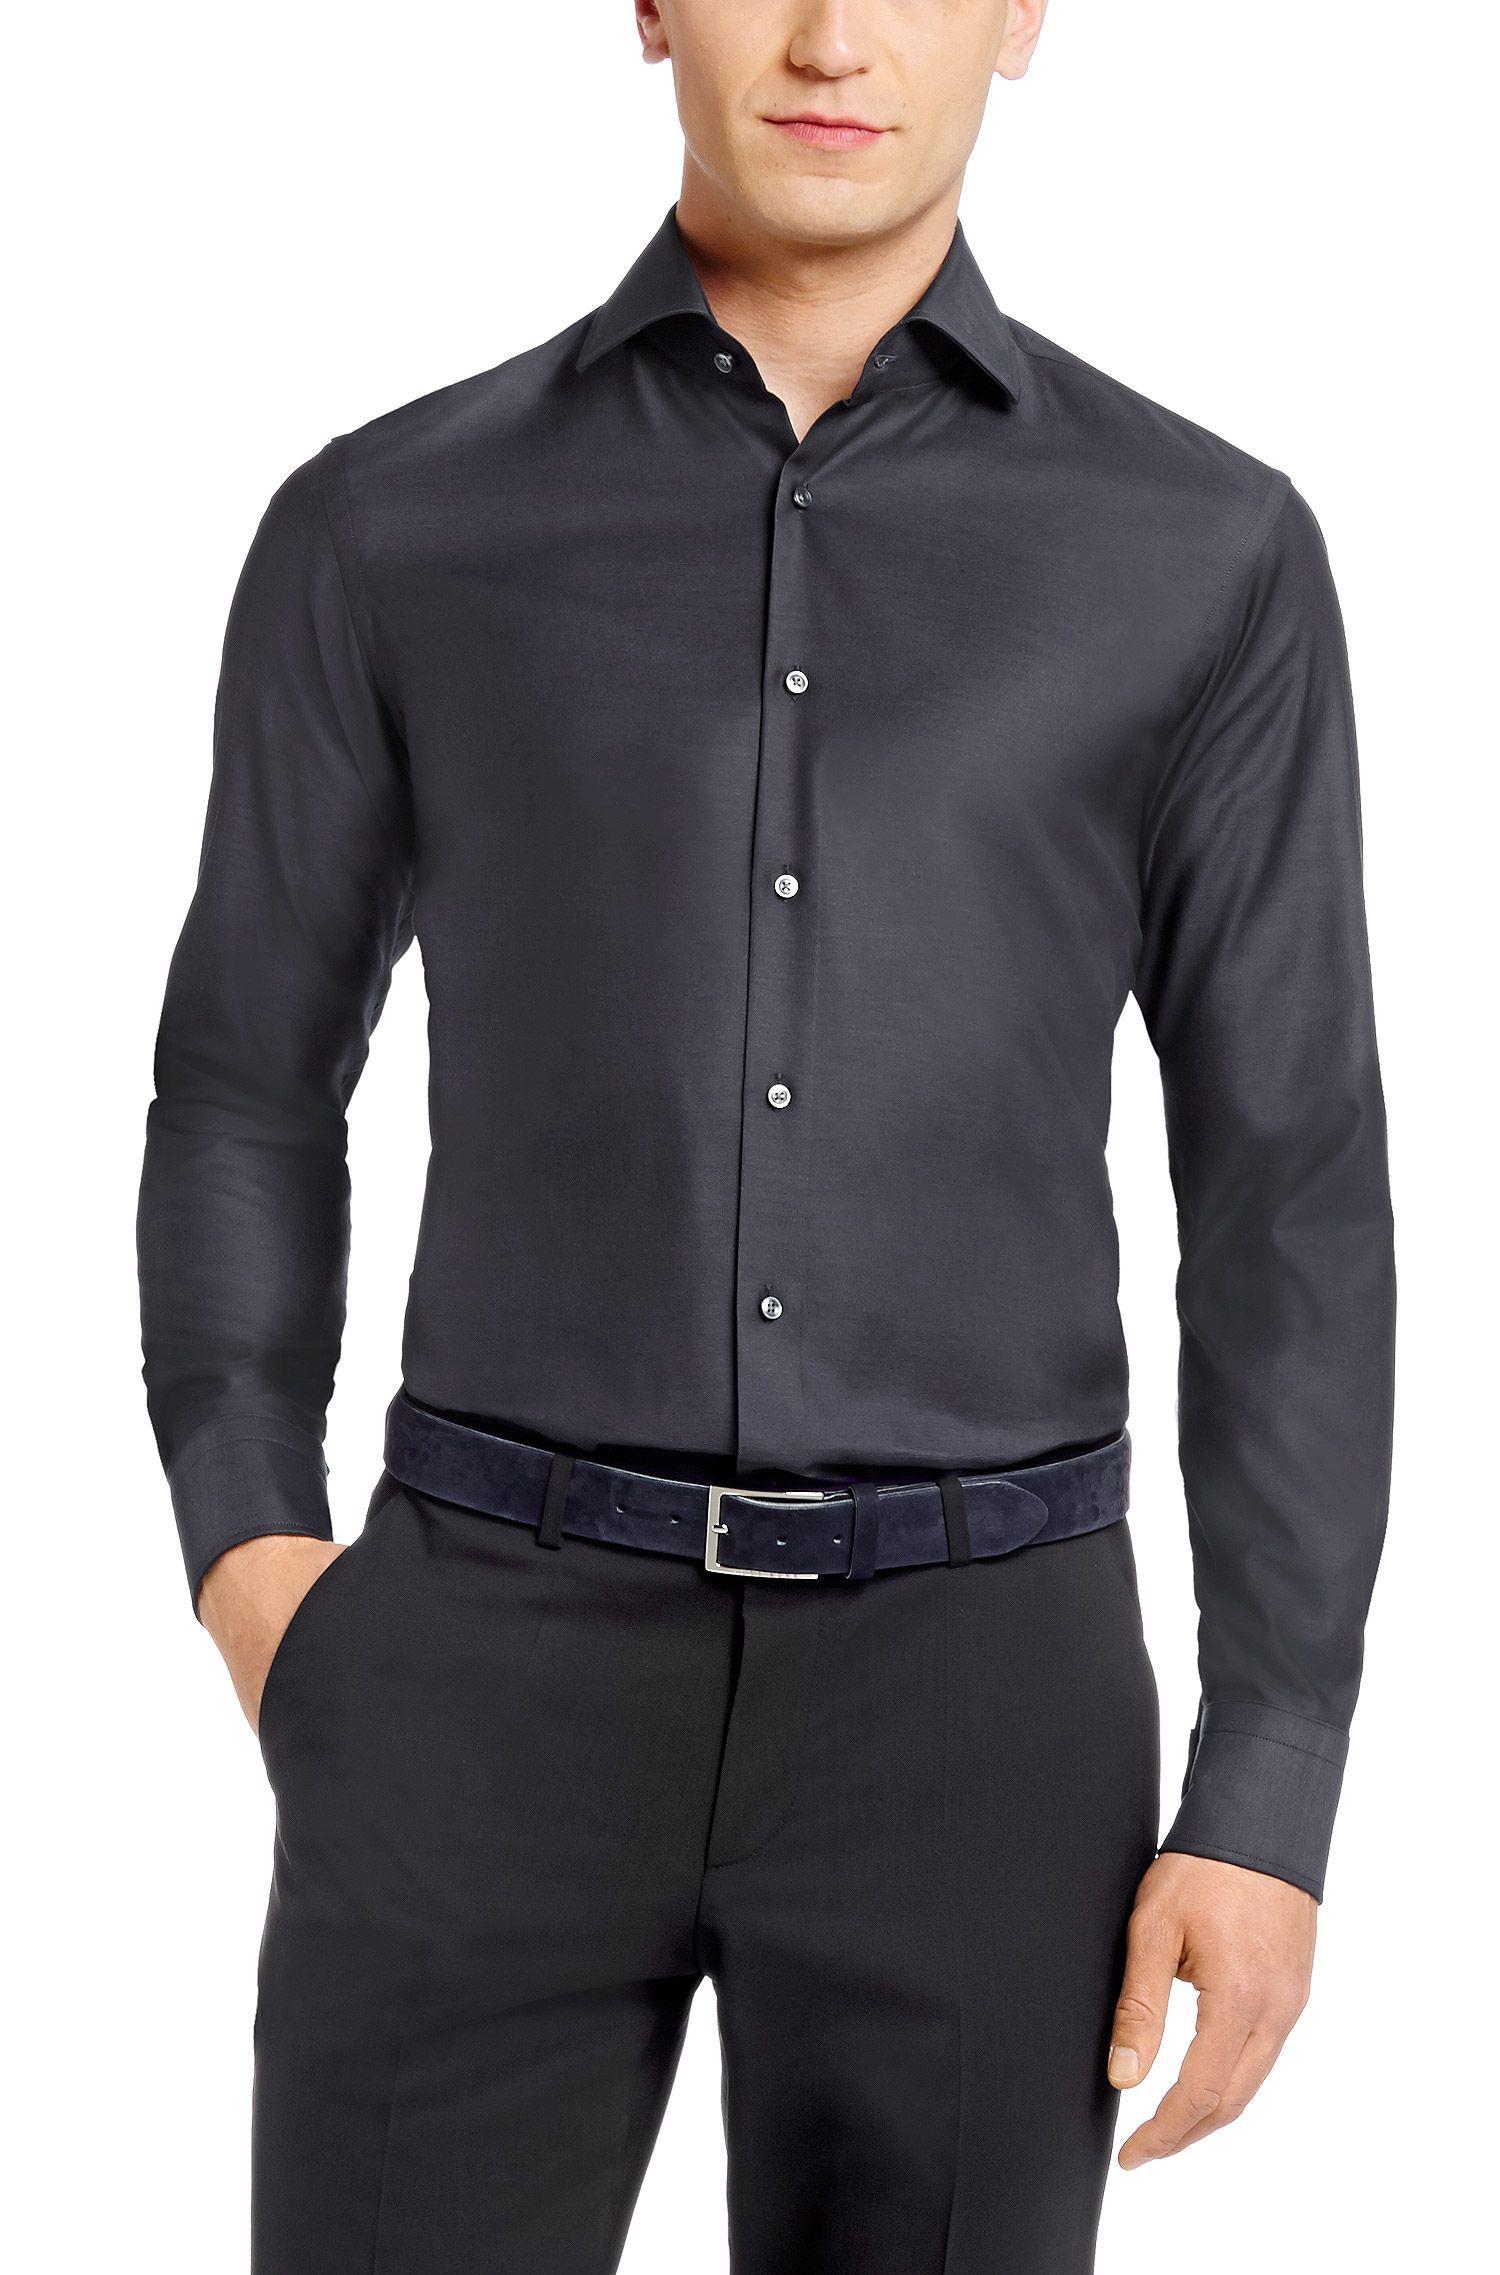 bef10a738 BOSS Chemise Business Regular Fit Gerald avec col italien Gris sombre prix  Chemise homme Hugo Boss 125.00 €